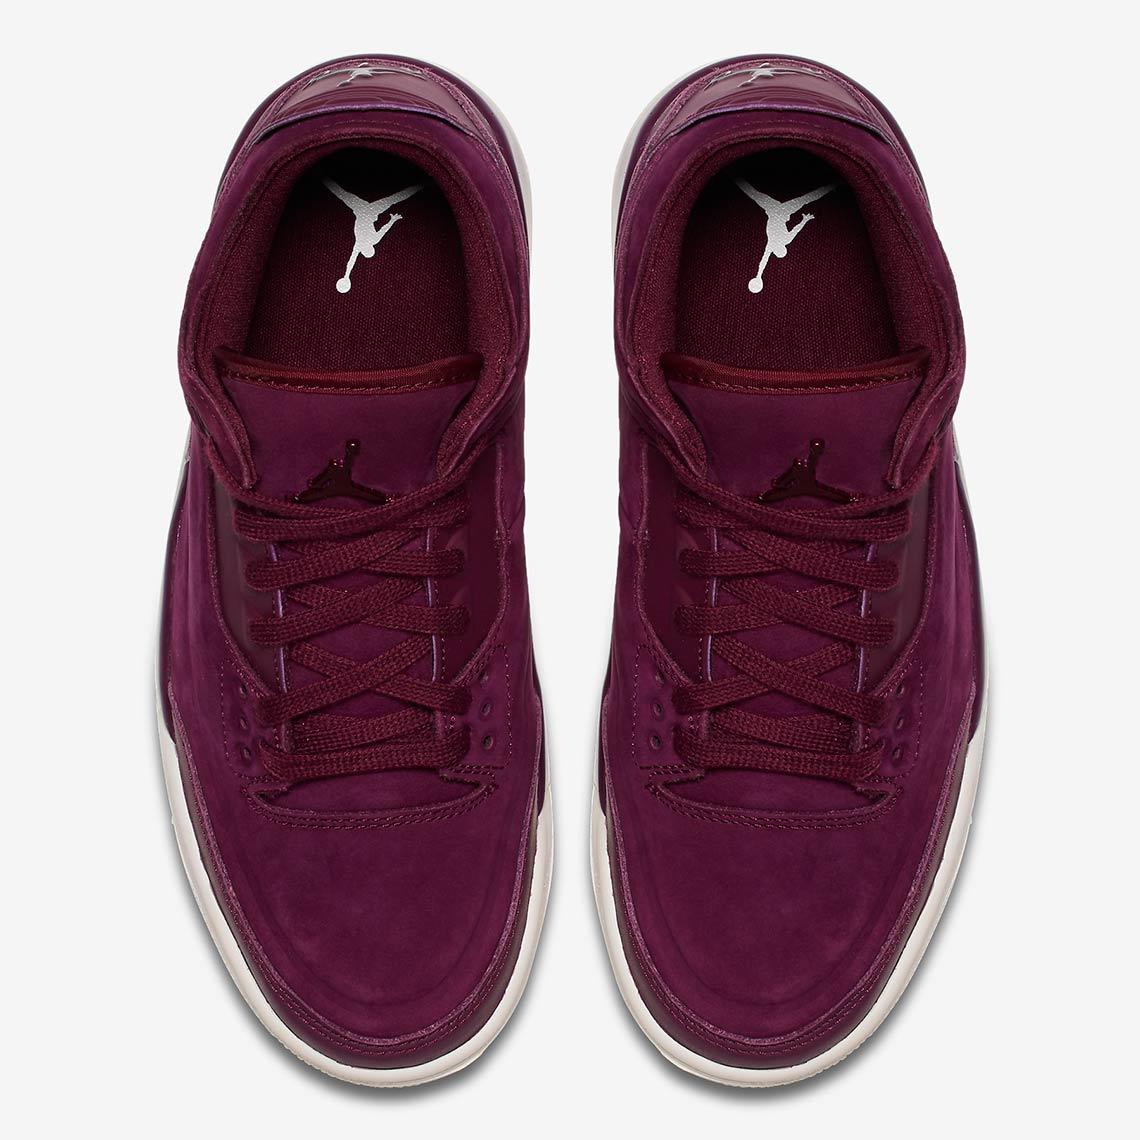 cac3d646b0d Where To Buy Air Jordan 3 Bordeaux   SneakerNews.com